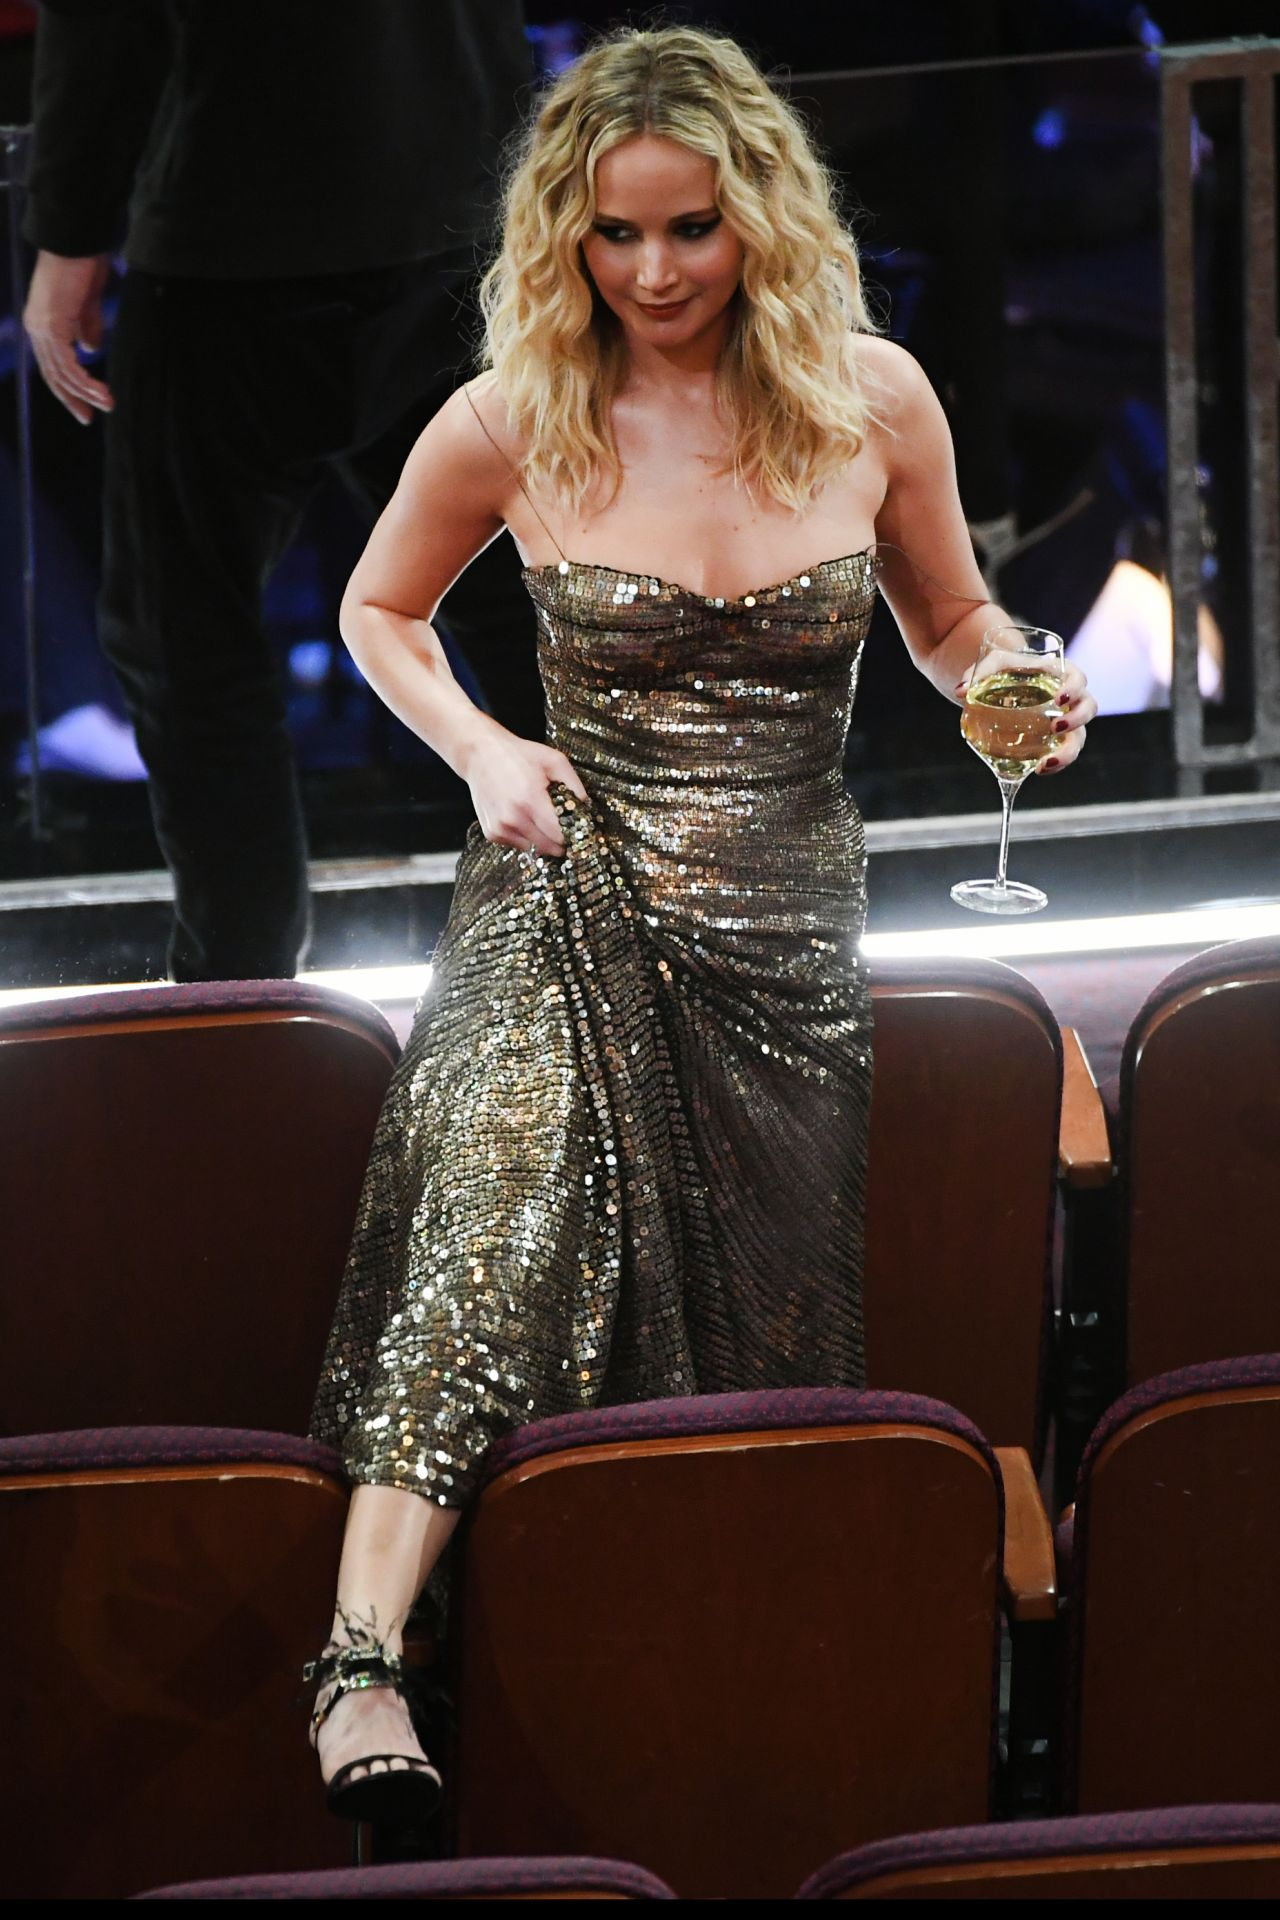 Christian Wallpaper Fall Jennifer Lawrence Oscars 2018 Red Carpet